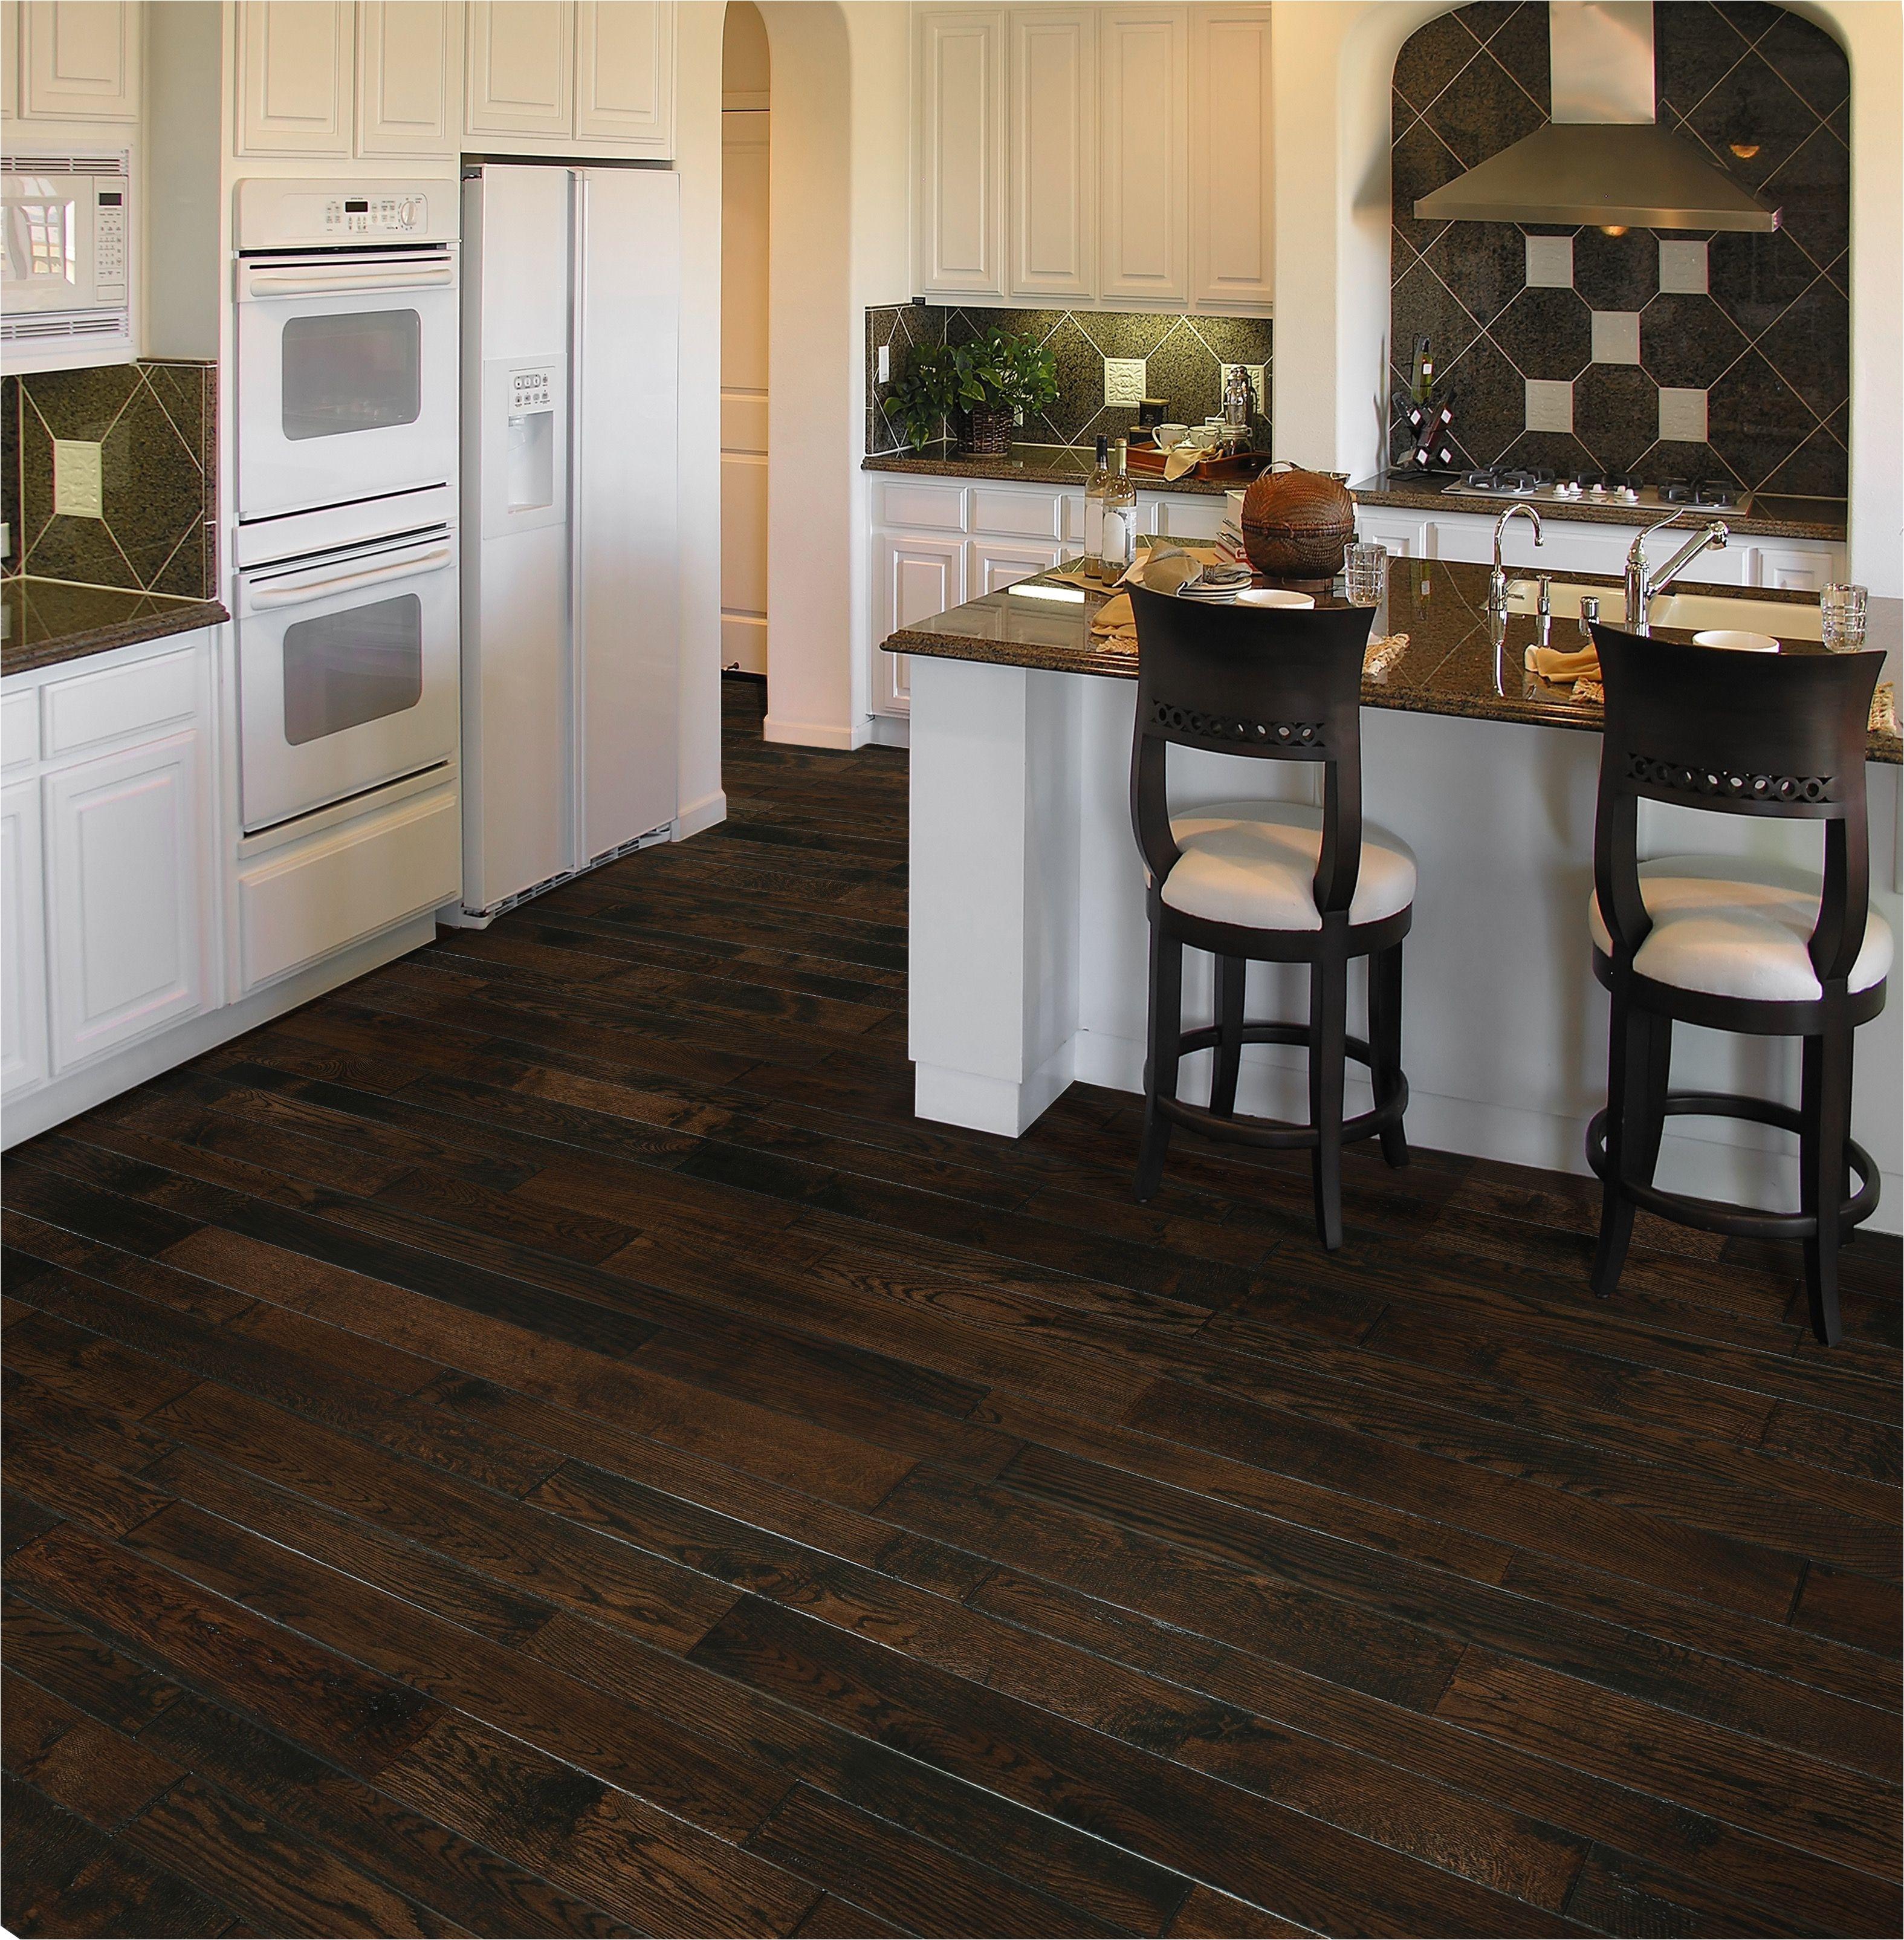 Woodpro Hardwood Floors Tulsa 30 Awesome Cork Flooring for Kitchen Trinitycountyfoodbank Com